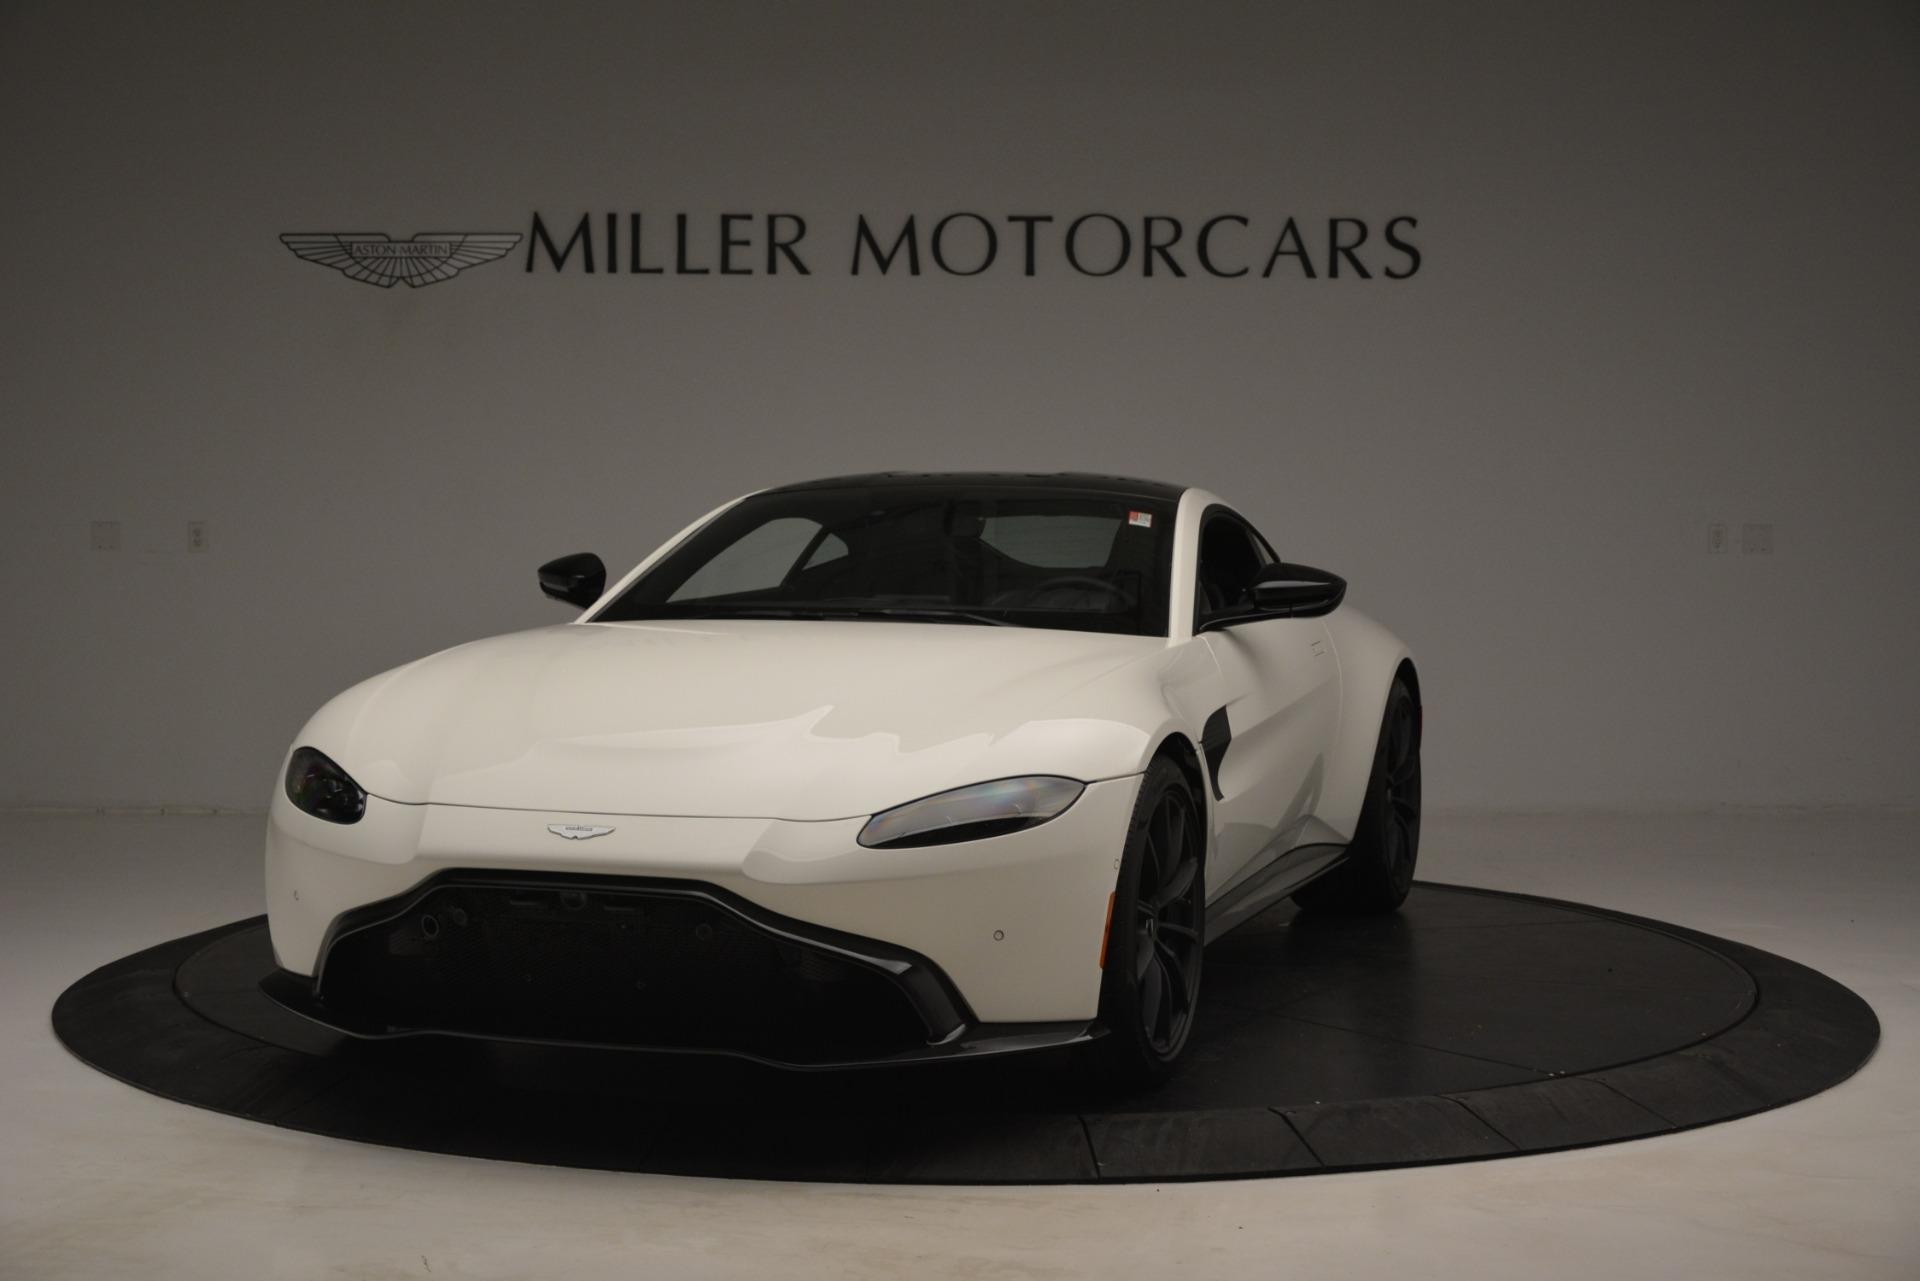 New 2019 Aston Martin Vantage Coupe For Sale In Greenwich, CT. Alfa Romeo of Greenwich, A1362 3053_p2